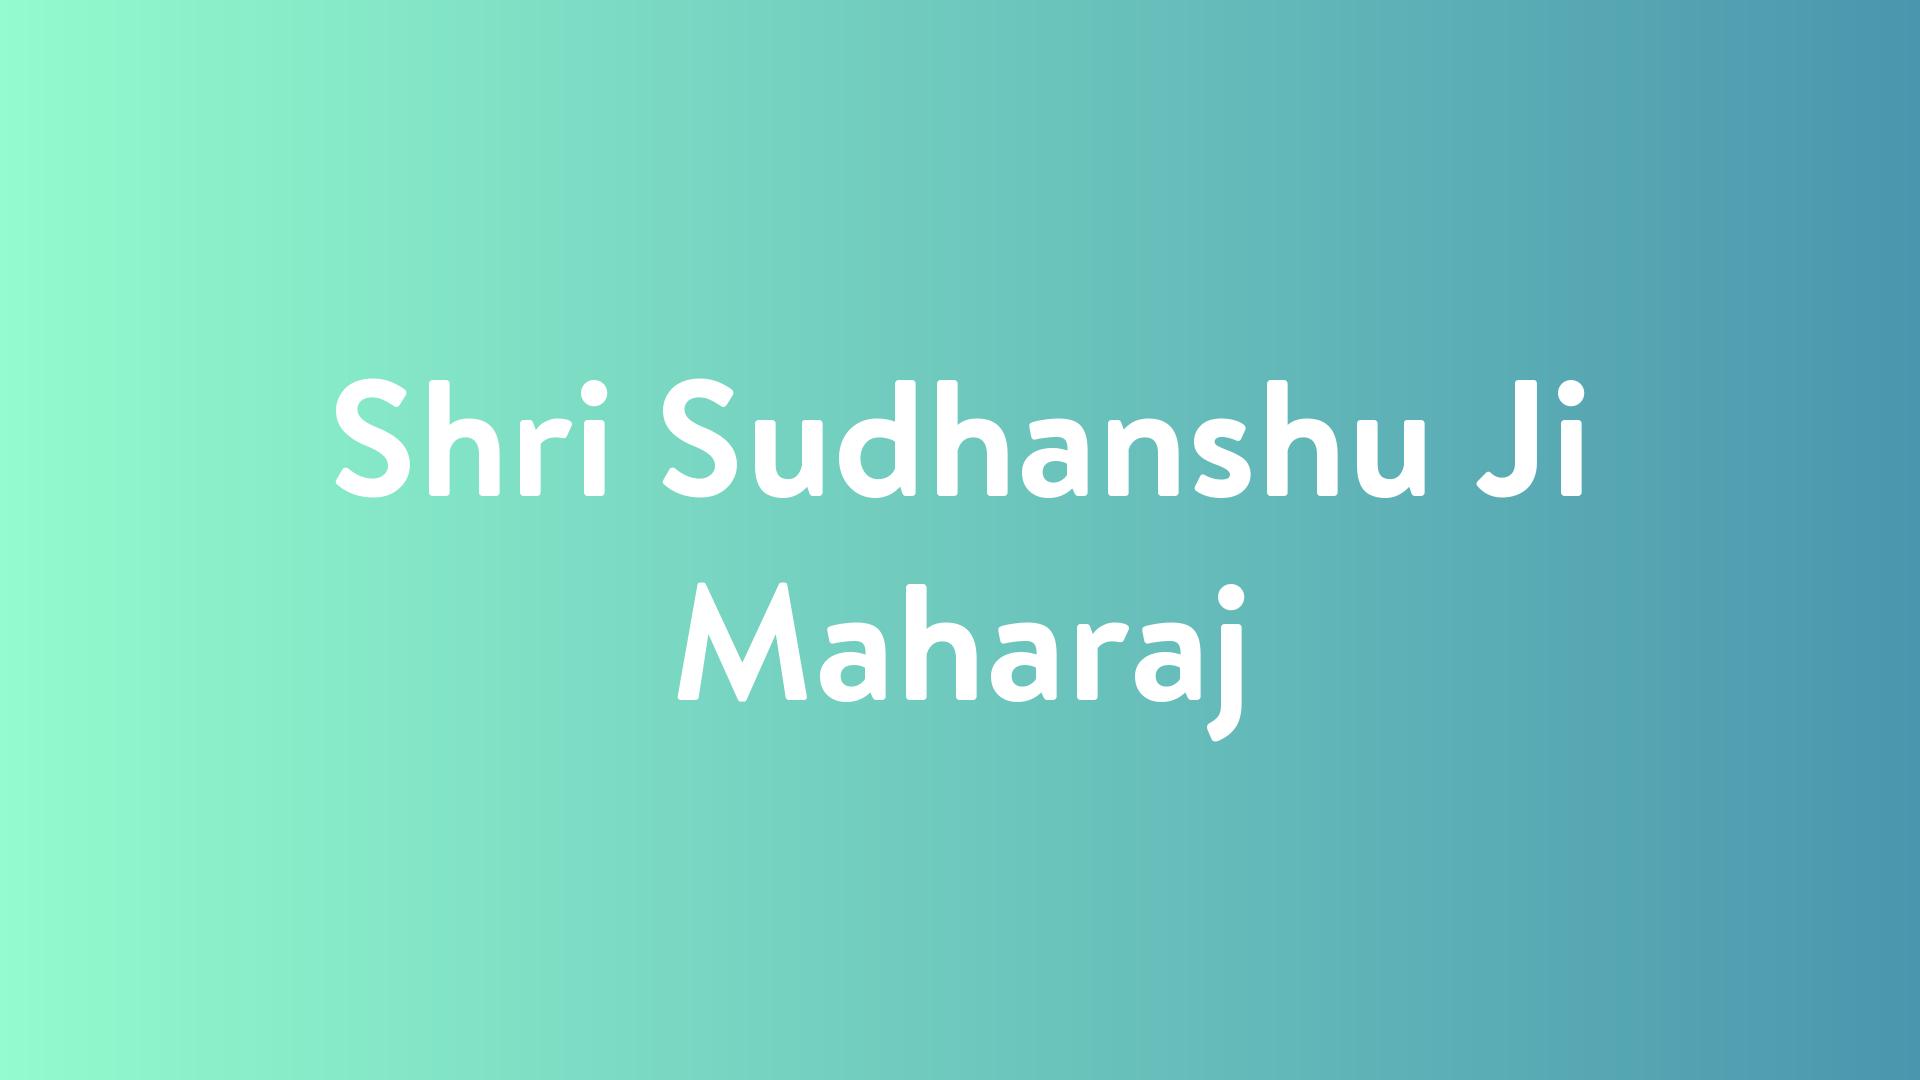 Stream And Watch Shri Sudhanshu Ji Maharaj Online | Sling TV